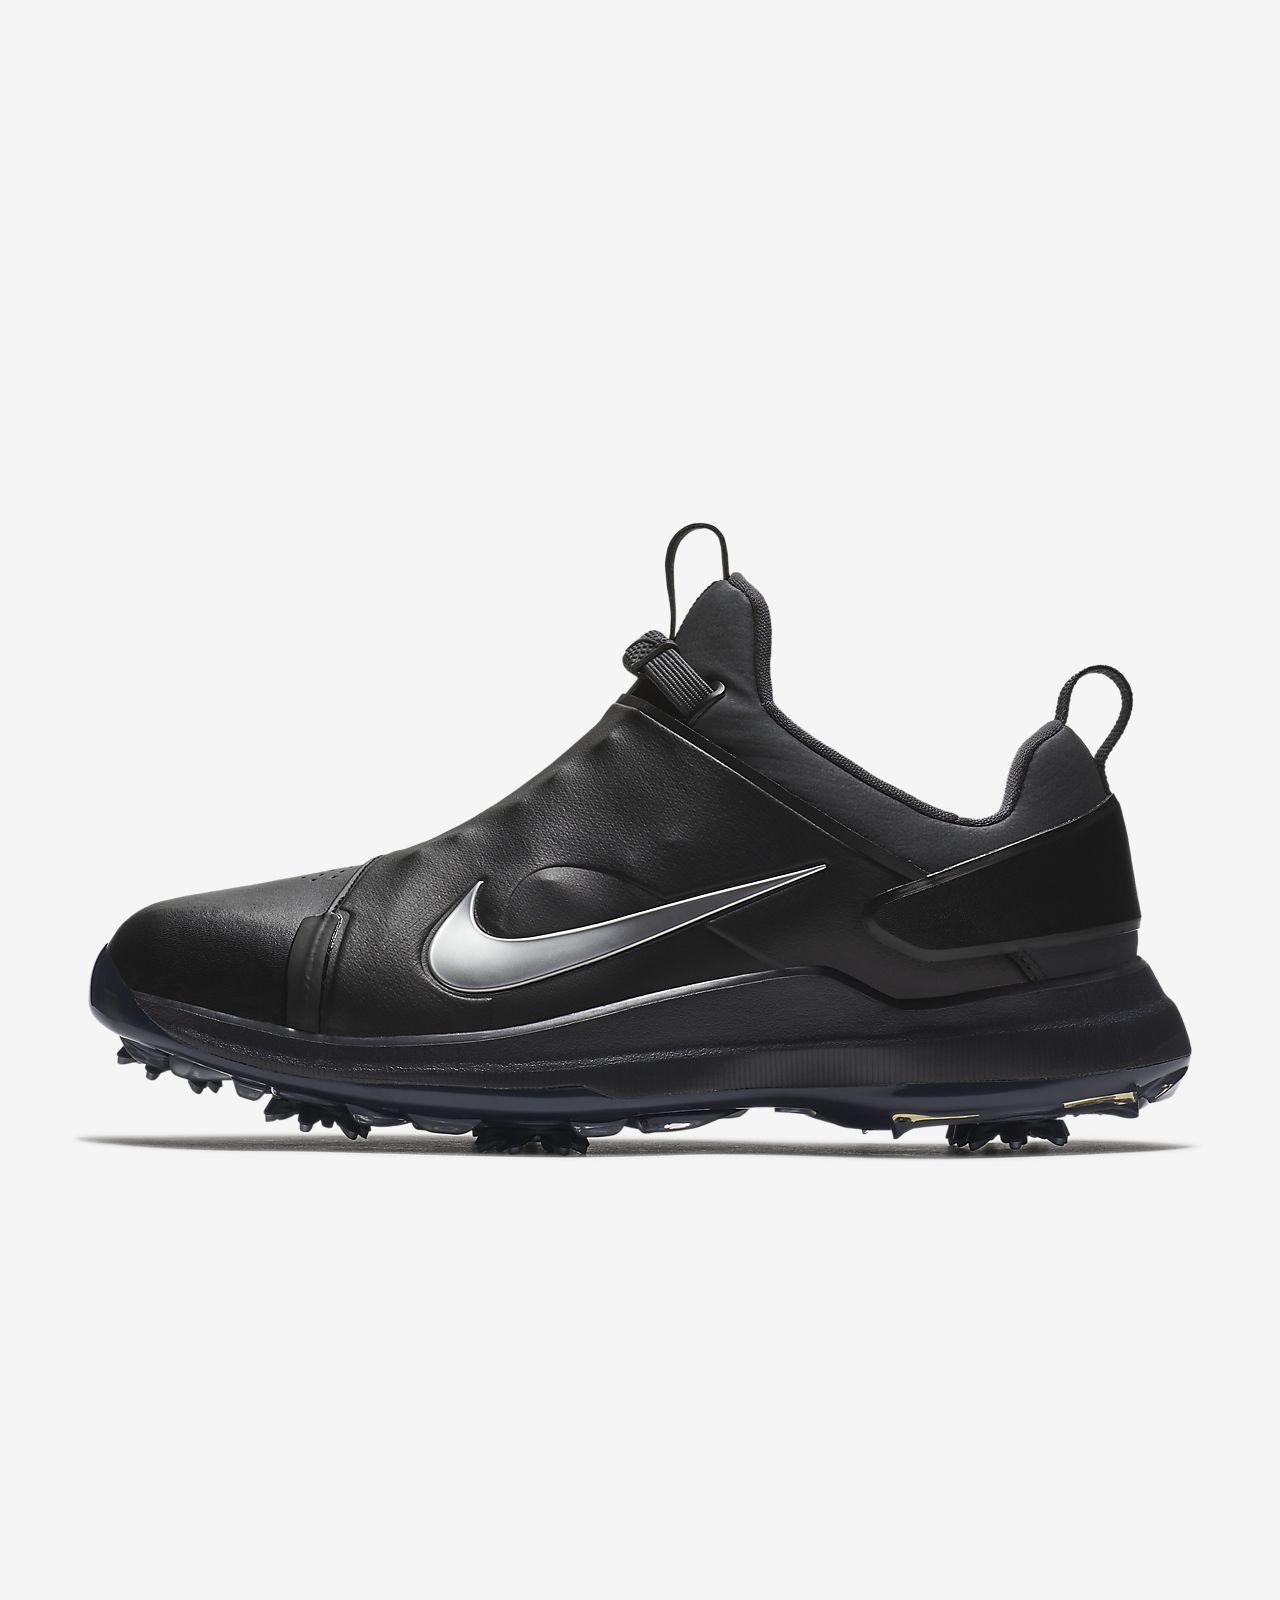 Nike Golf Tour Premiere Men's Golf Shoe